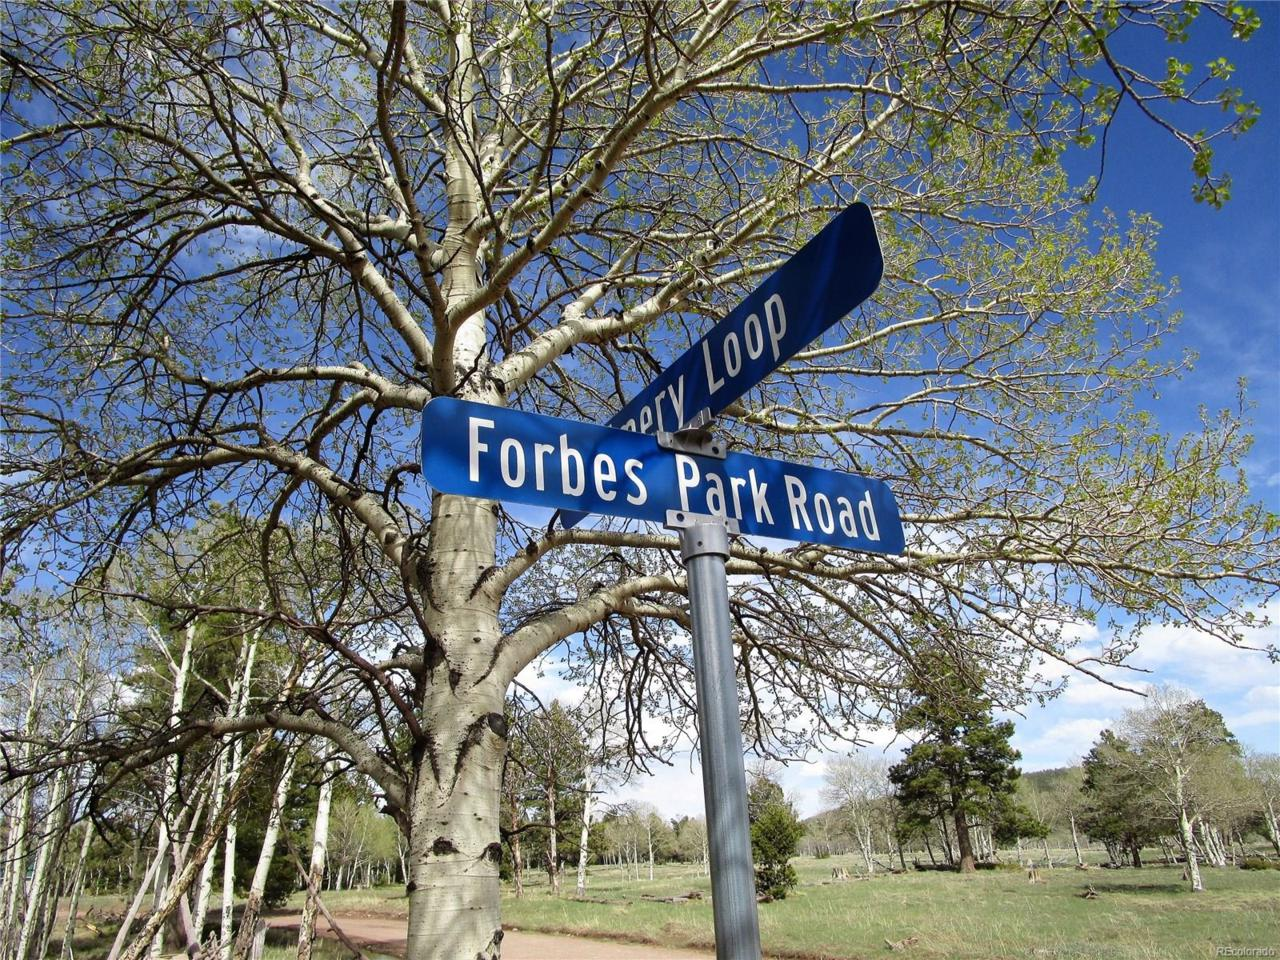 1389 Forbes Park Road, Fort Garland, CO 81133 (MLS #4884555) :: 8z Real Estate